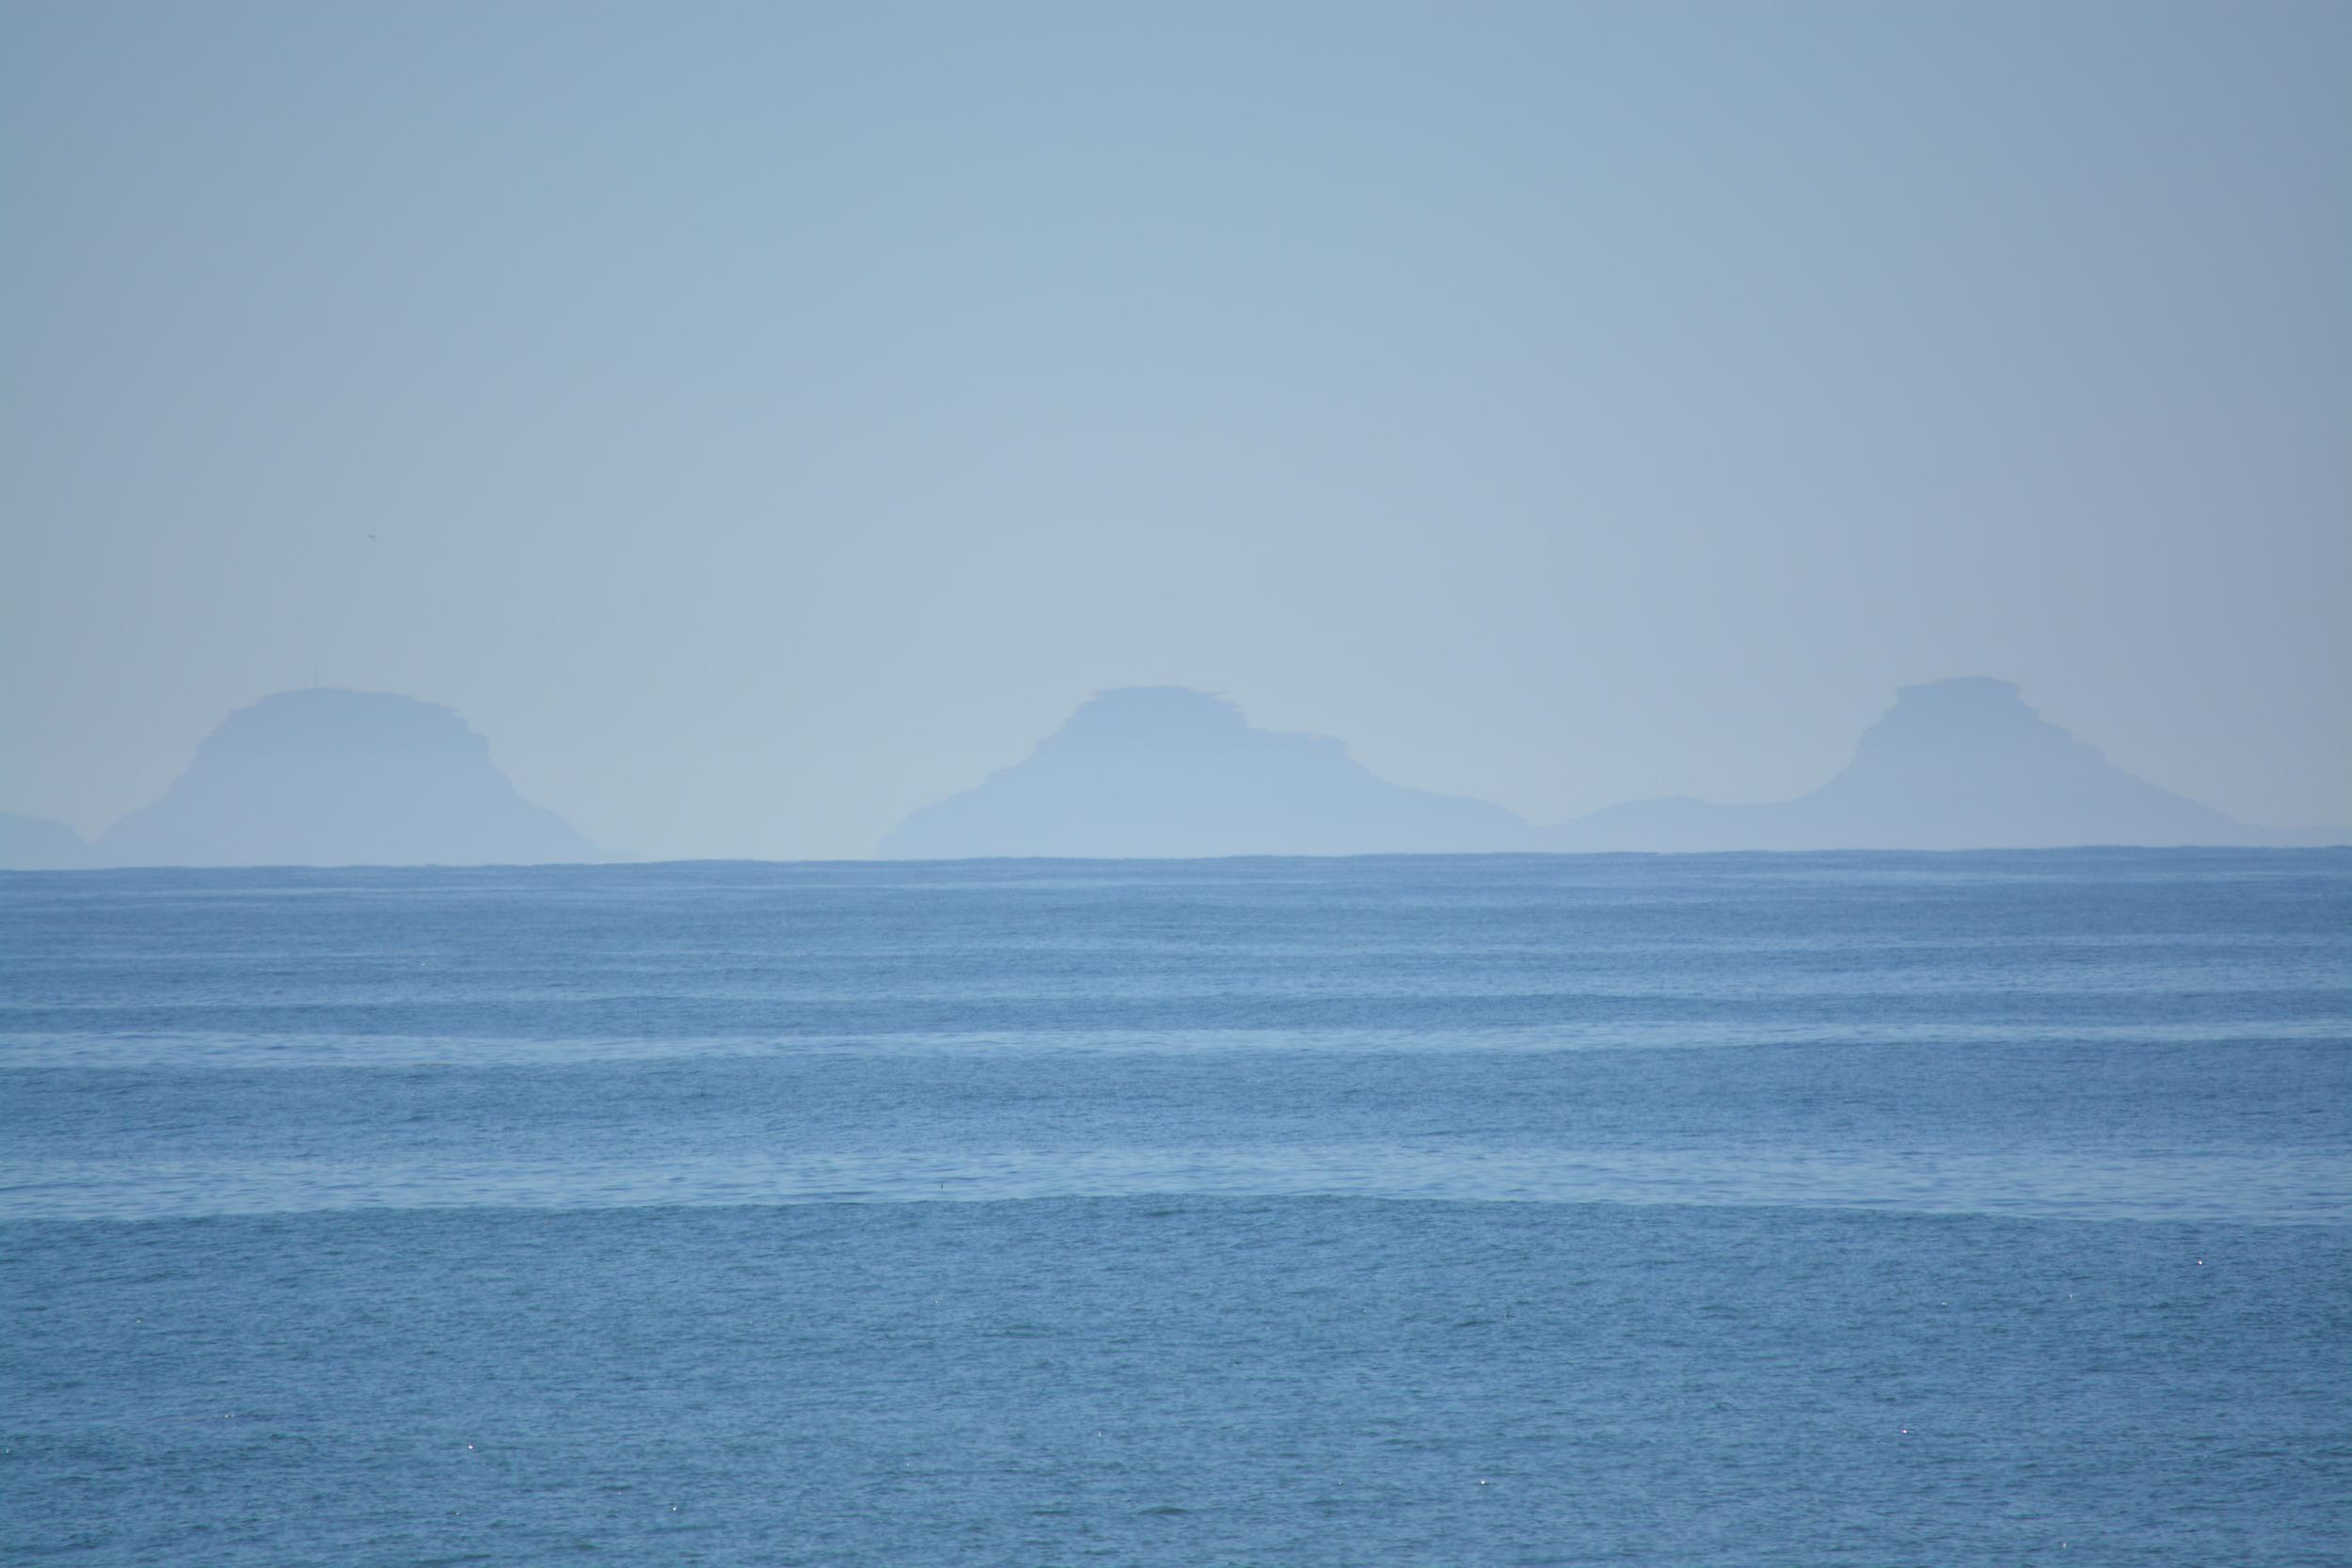 Baja California 10-5-13 Shipwrecks Surfing Adventure Ocean Experience Surf School San Diego (56).JPG